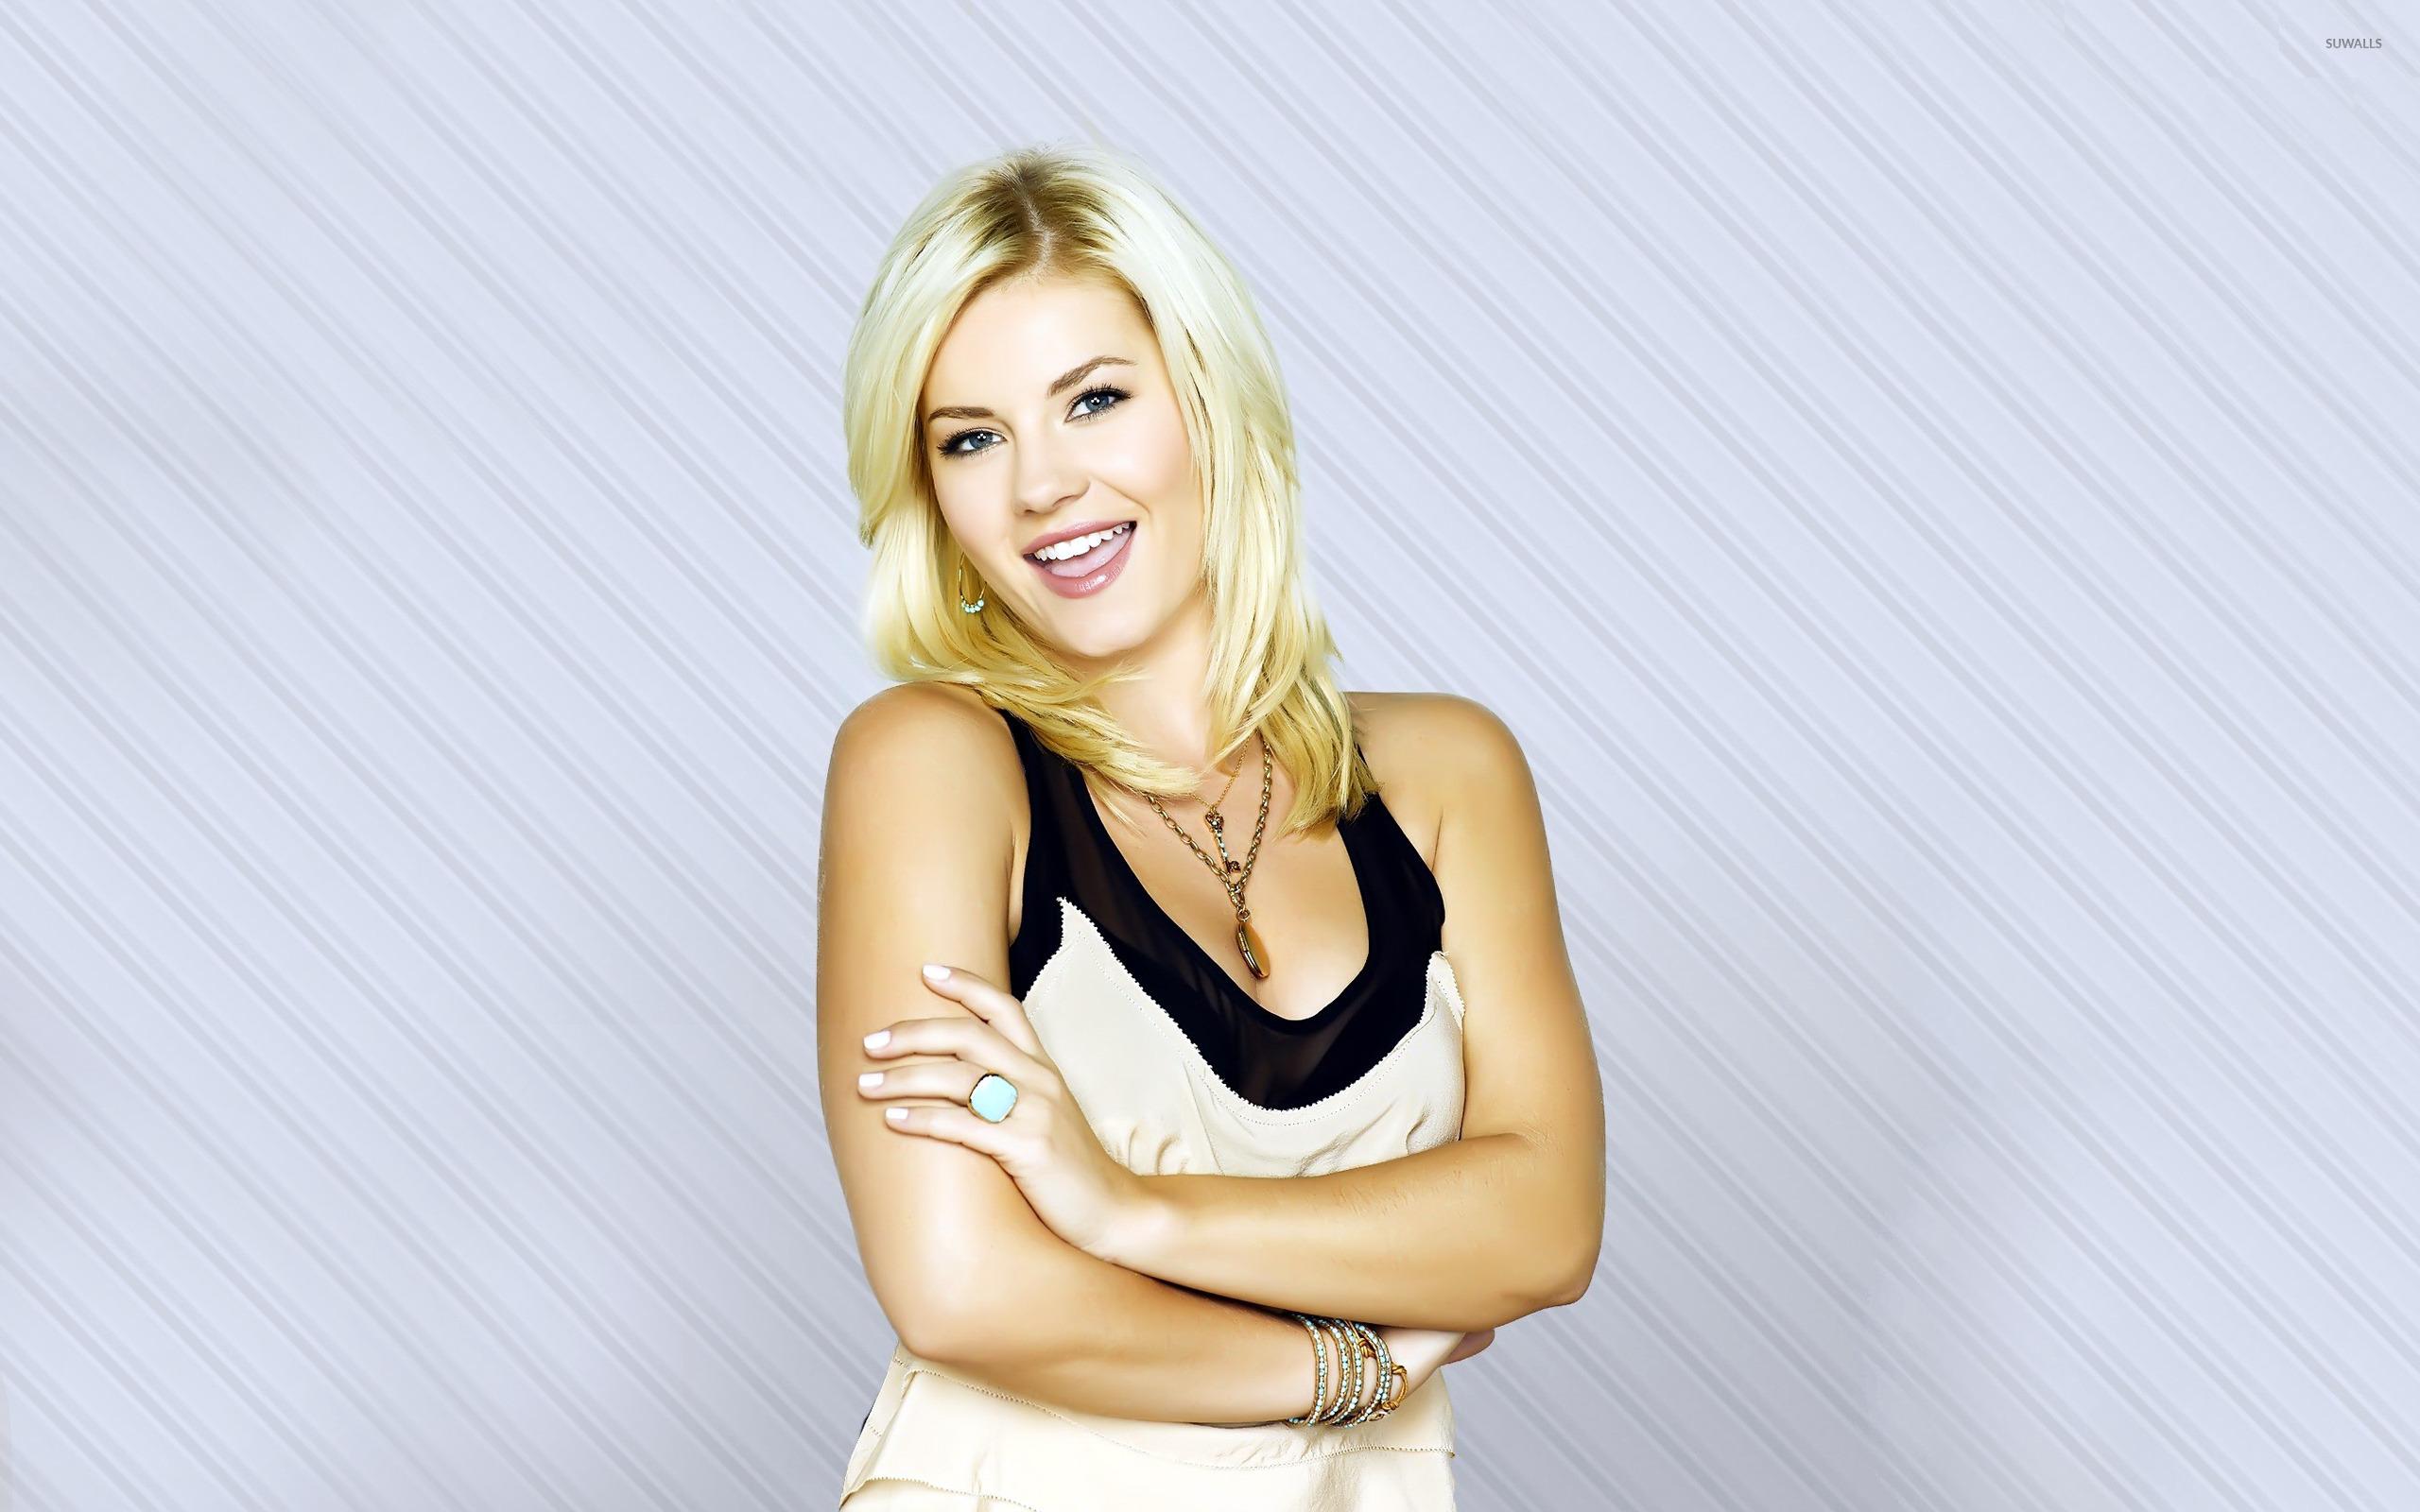 elisha cuthbert celebrity screensaver - photo #4